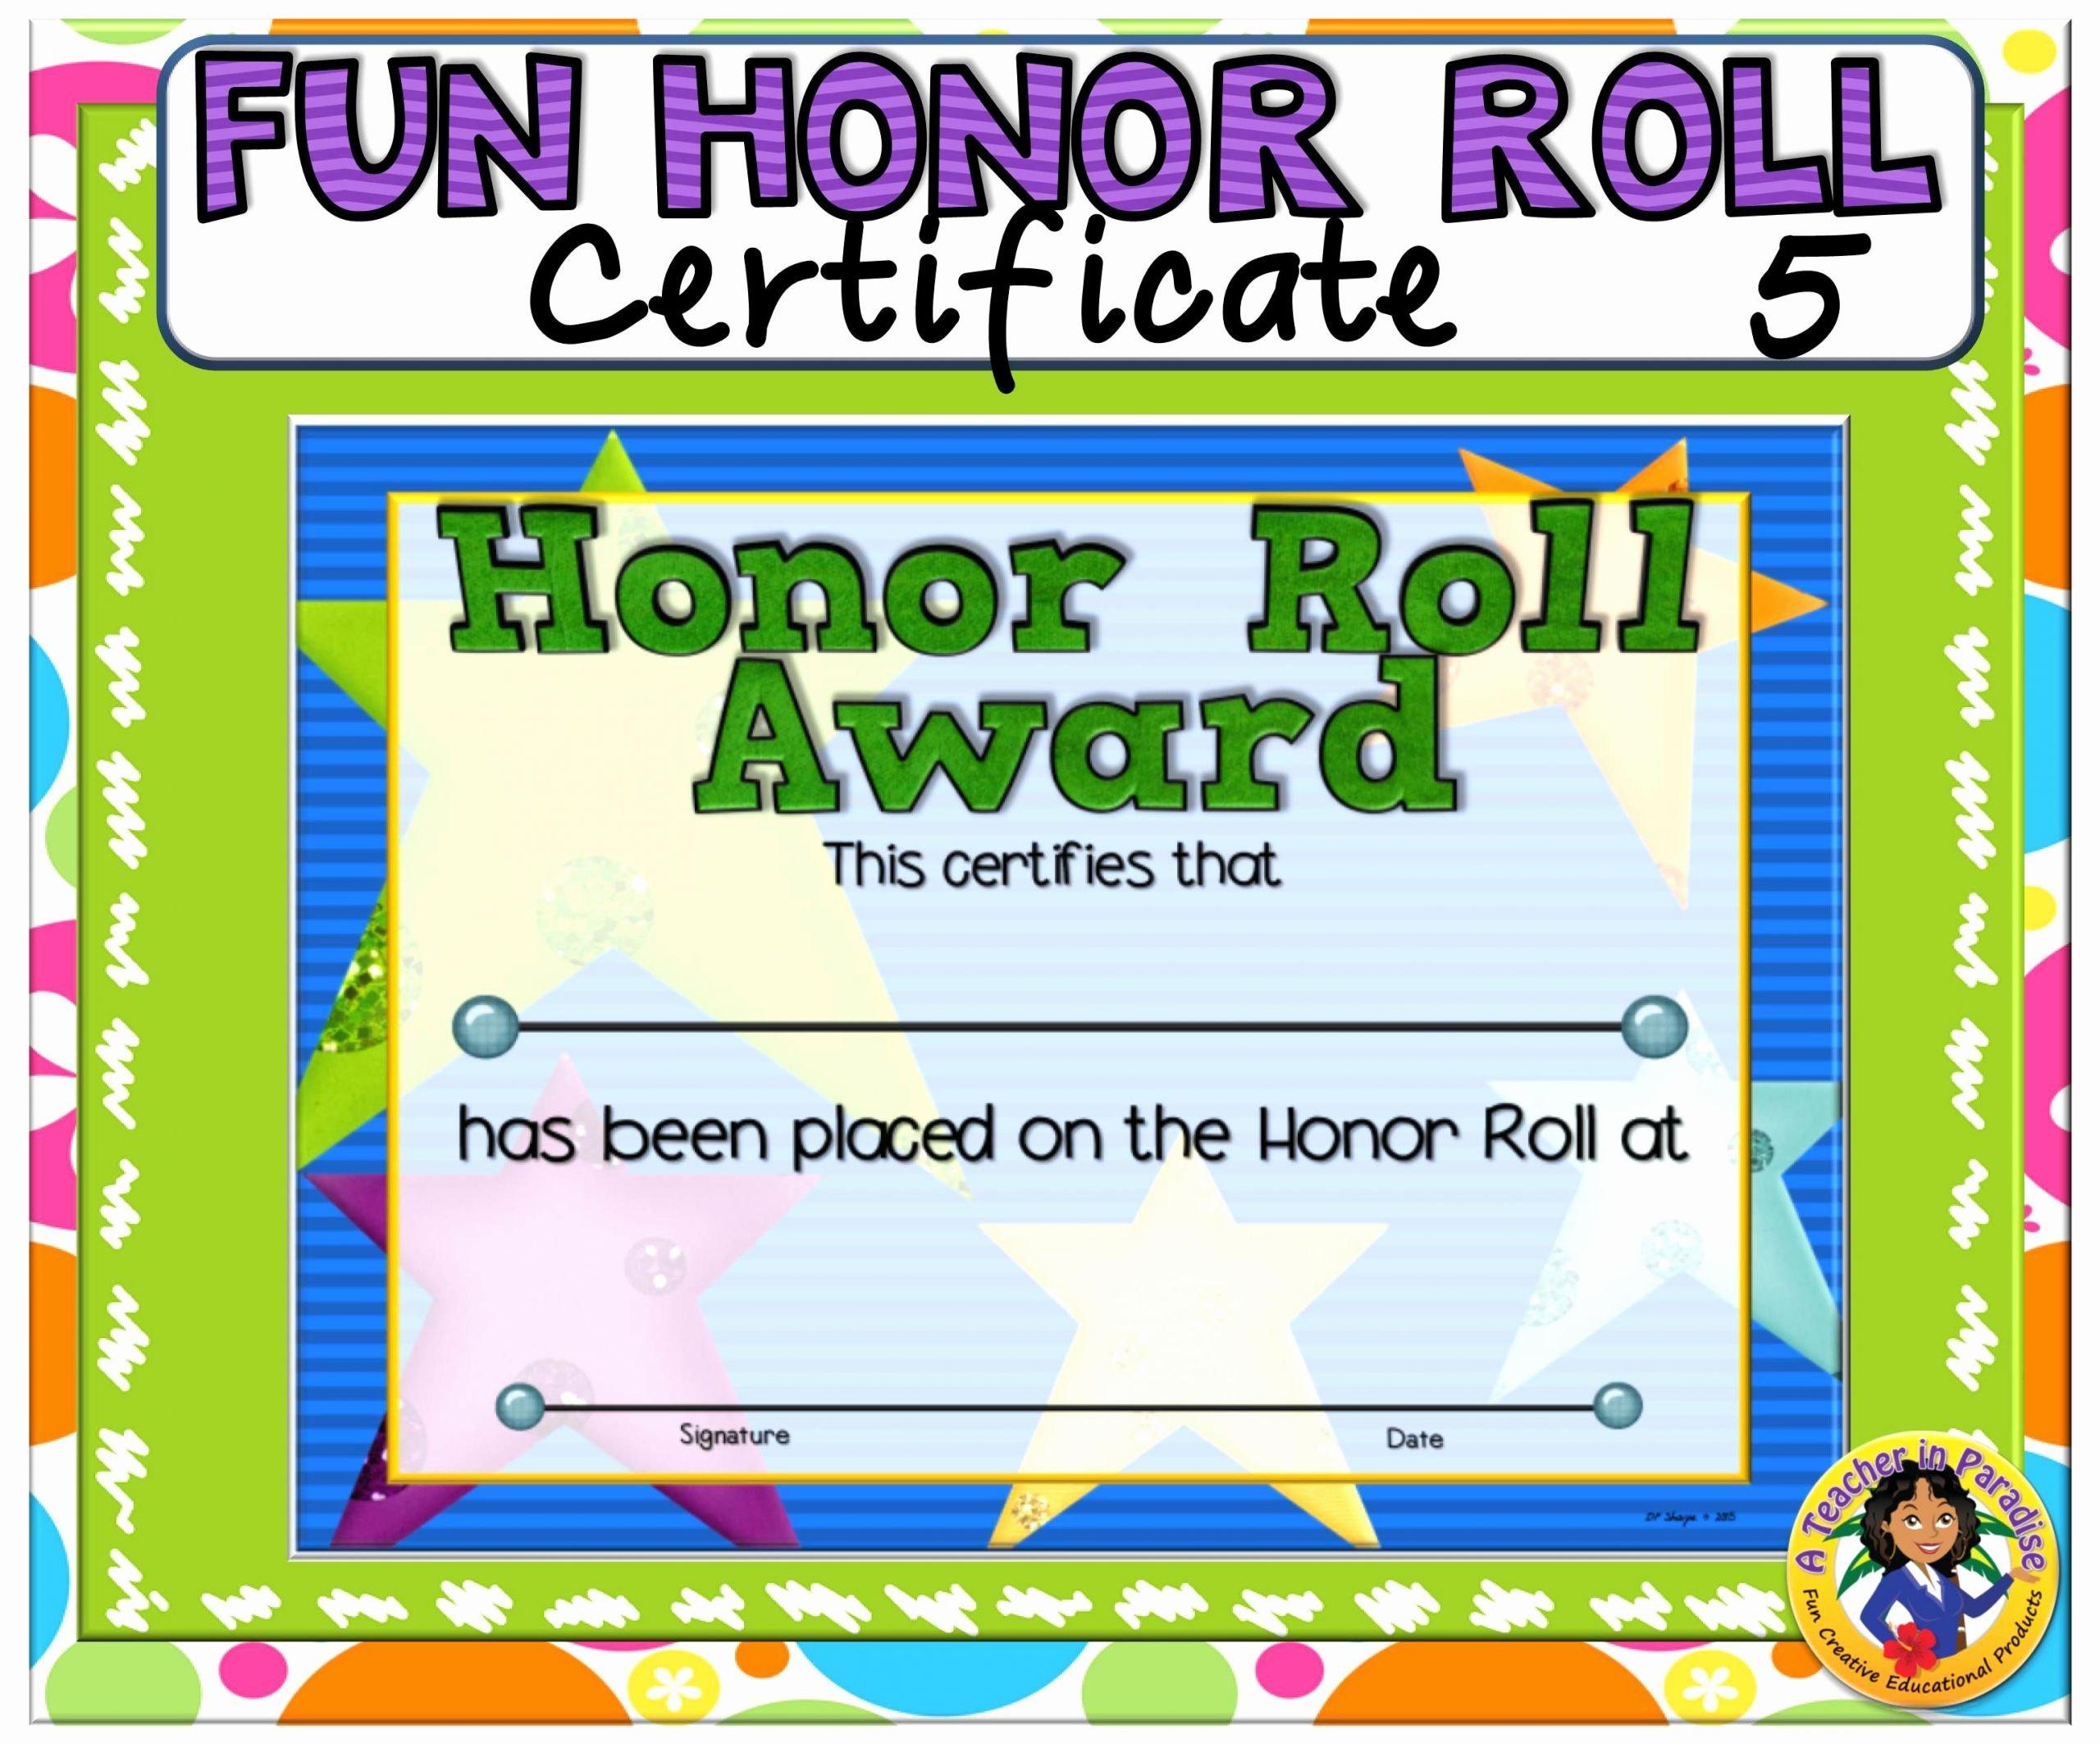 Free Honor Roll Certificate Templates Elegant Certificate Fun Honor Roll 5